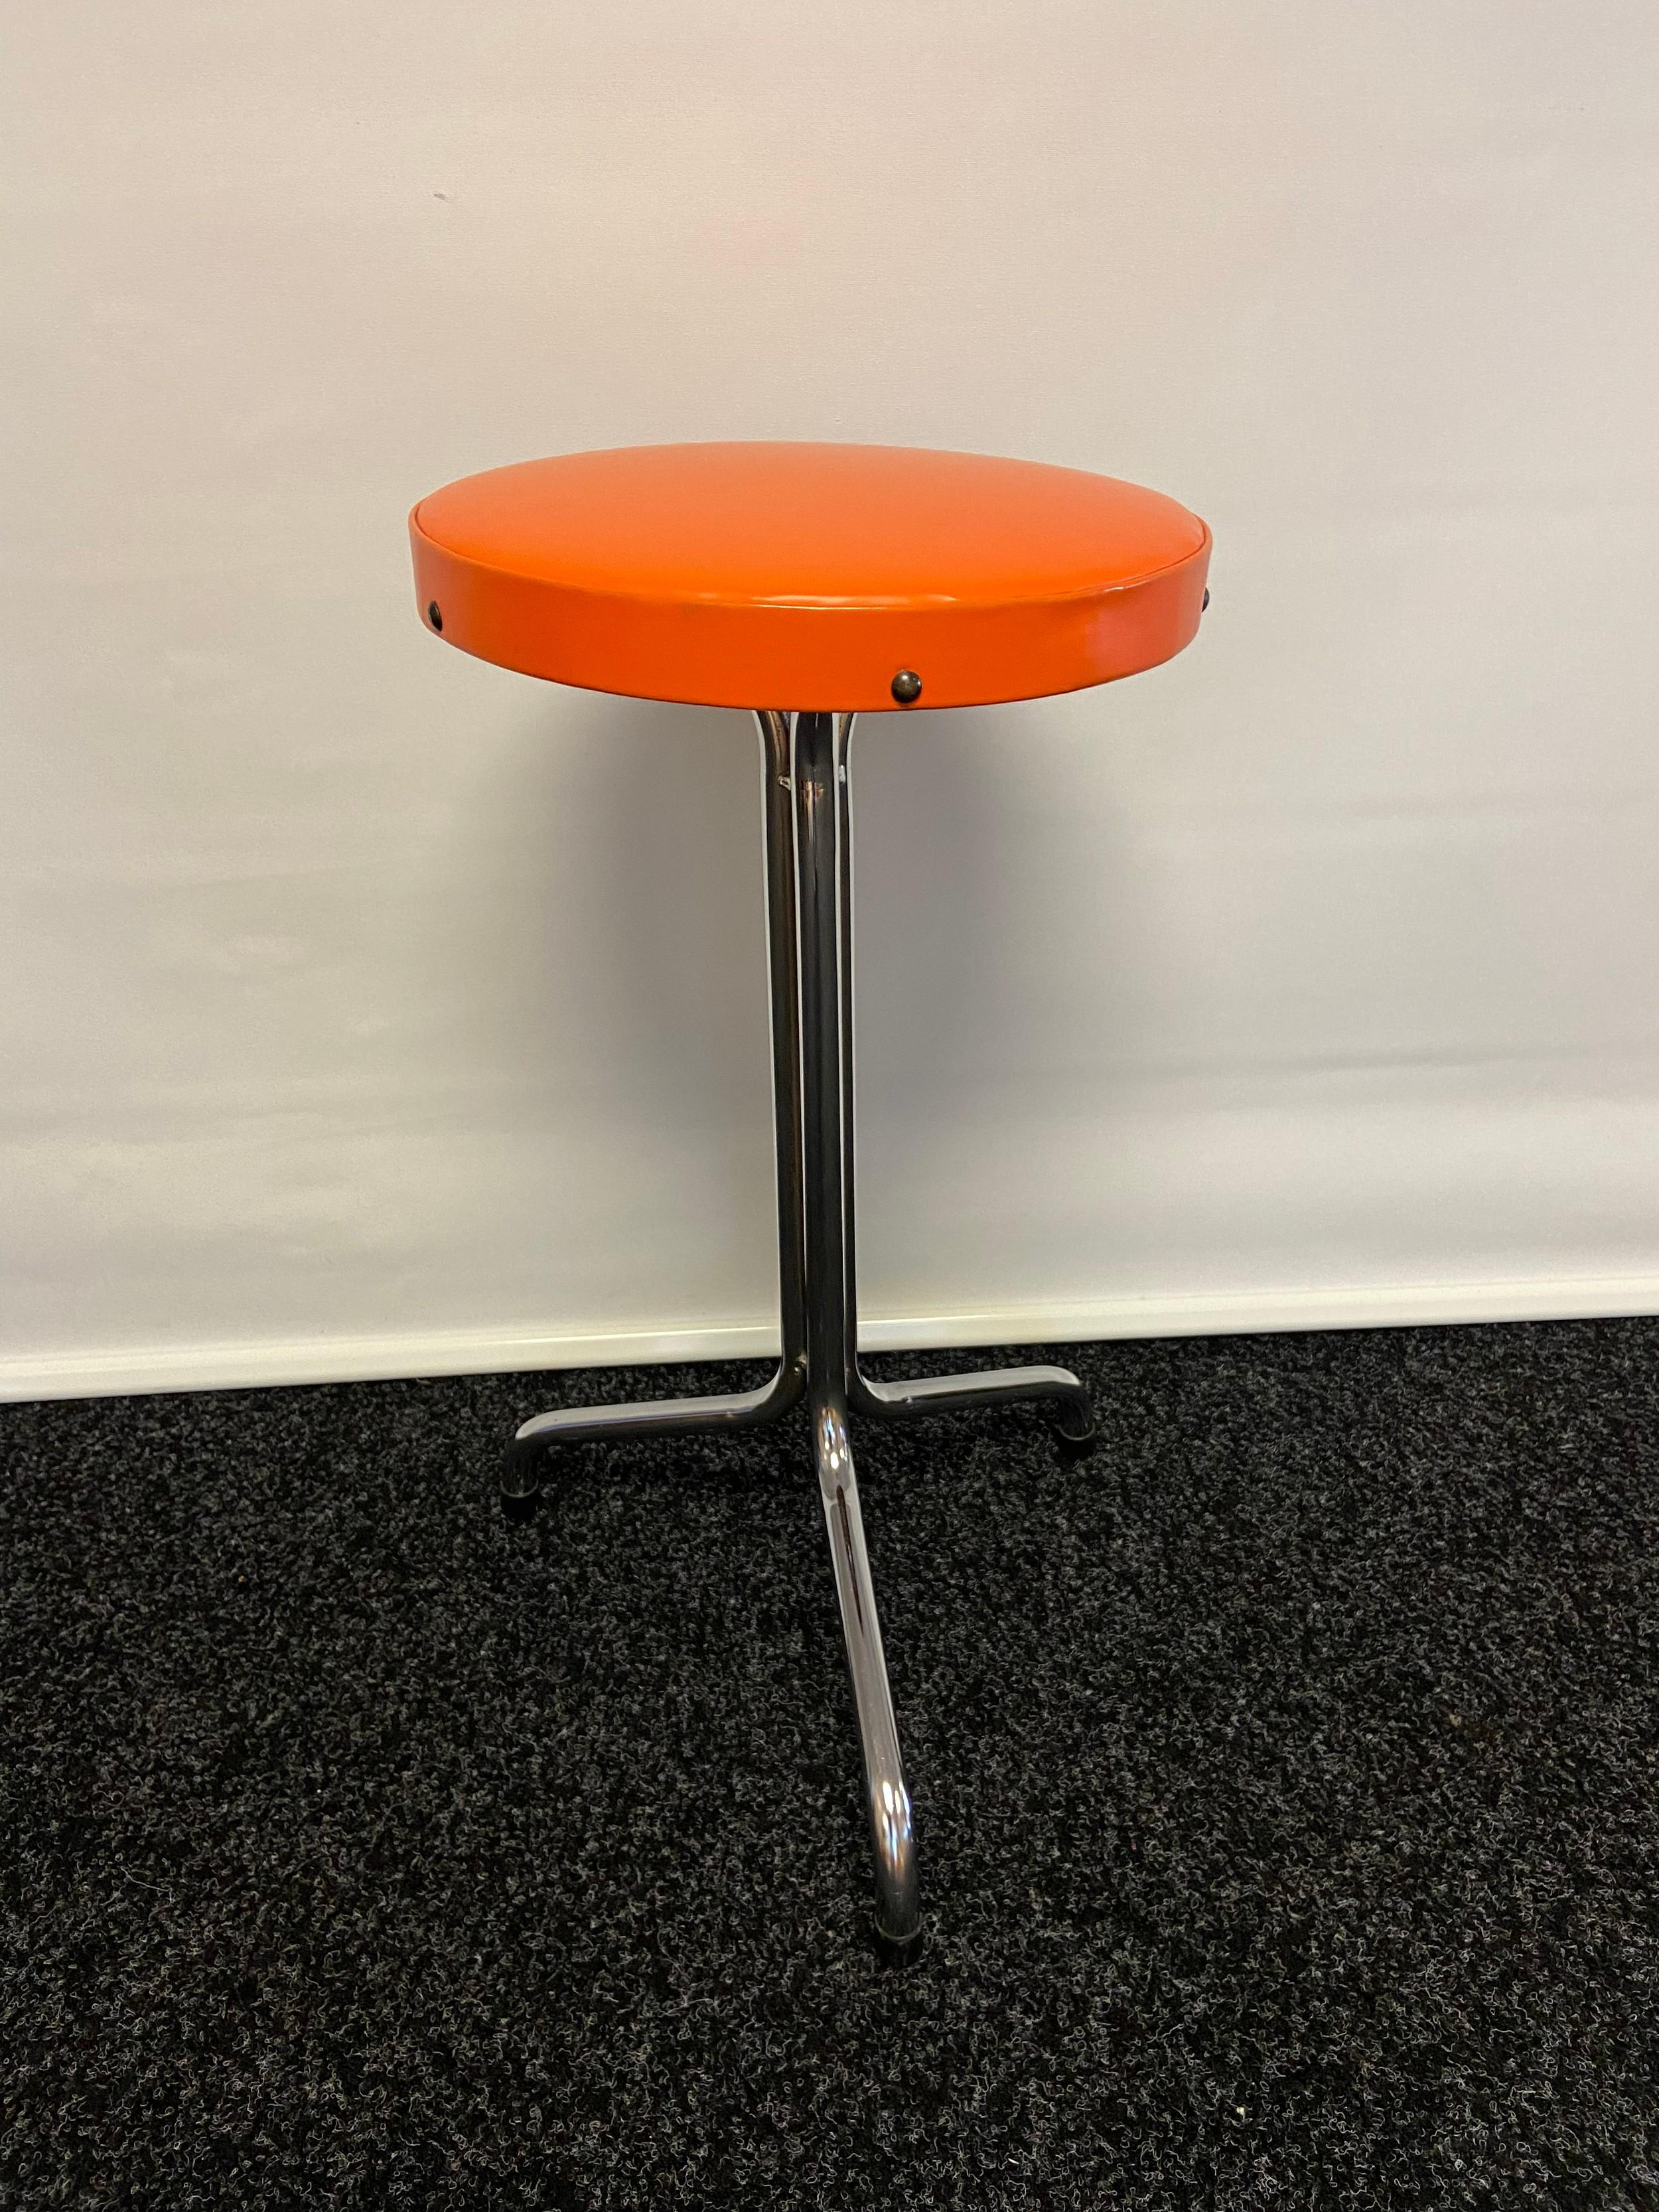 A Three legged mid century kitchen stool. Original orange covering [57cm]